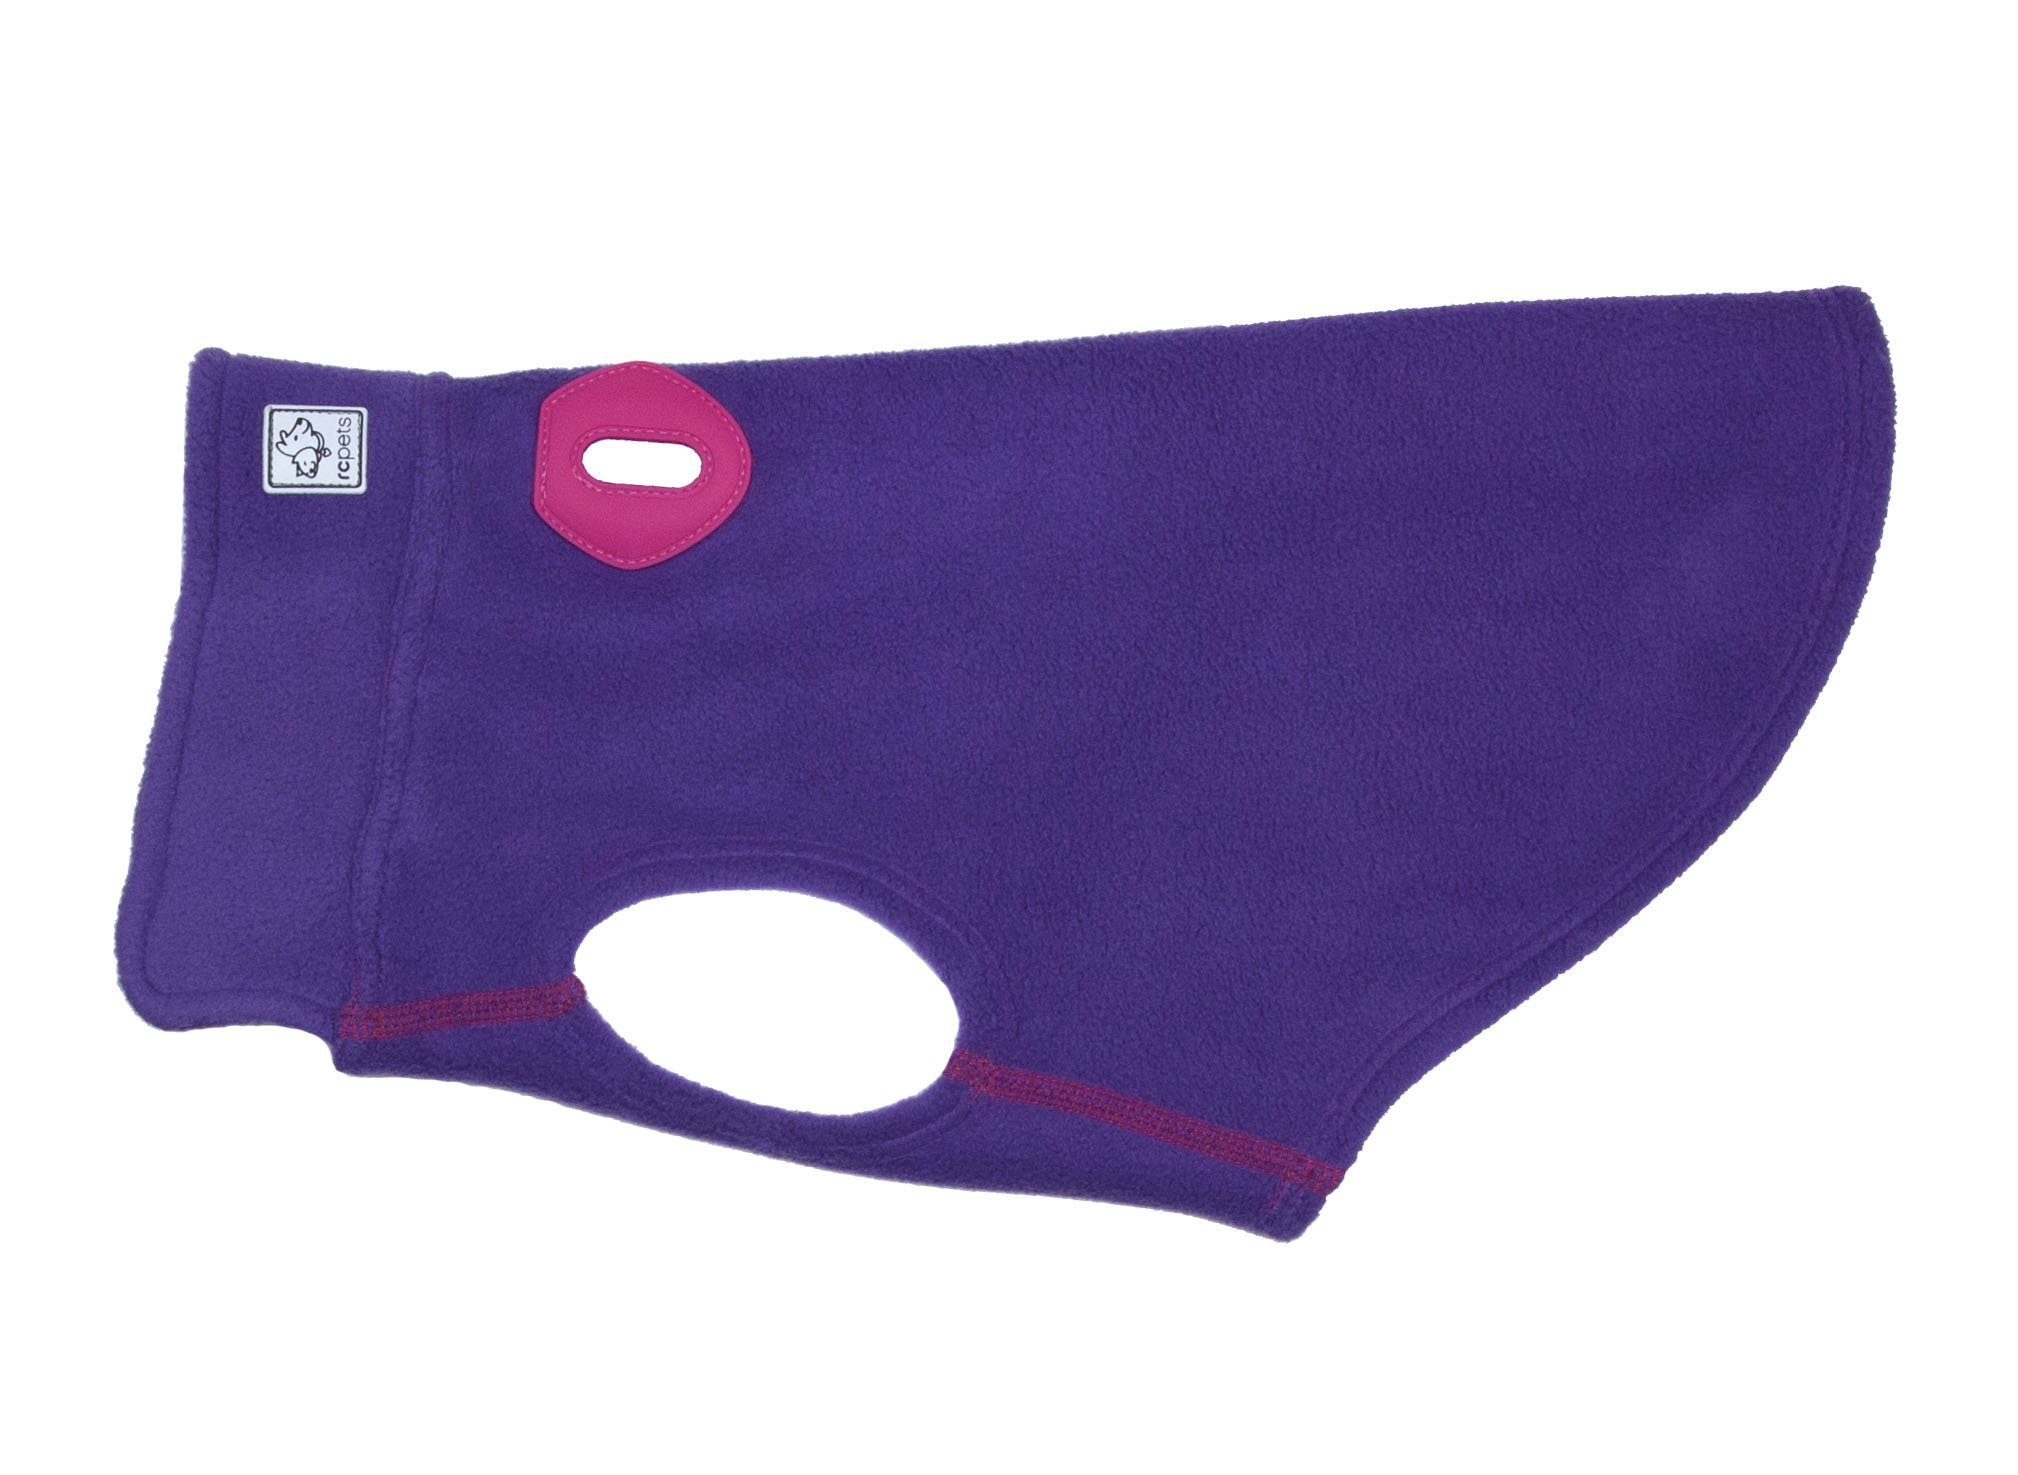 RC Pet Products Baseline Dog Fleece, Dog Coat, Size 12, Purple/Pink